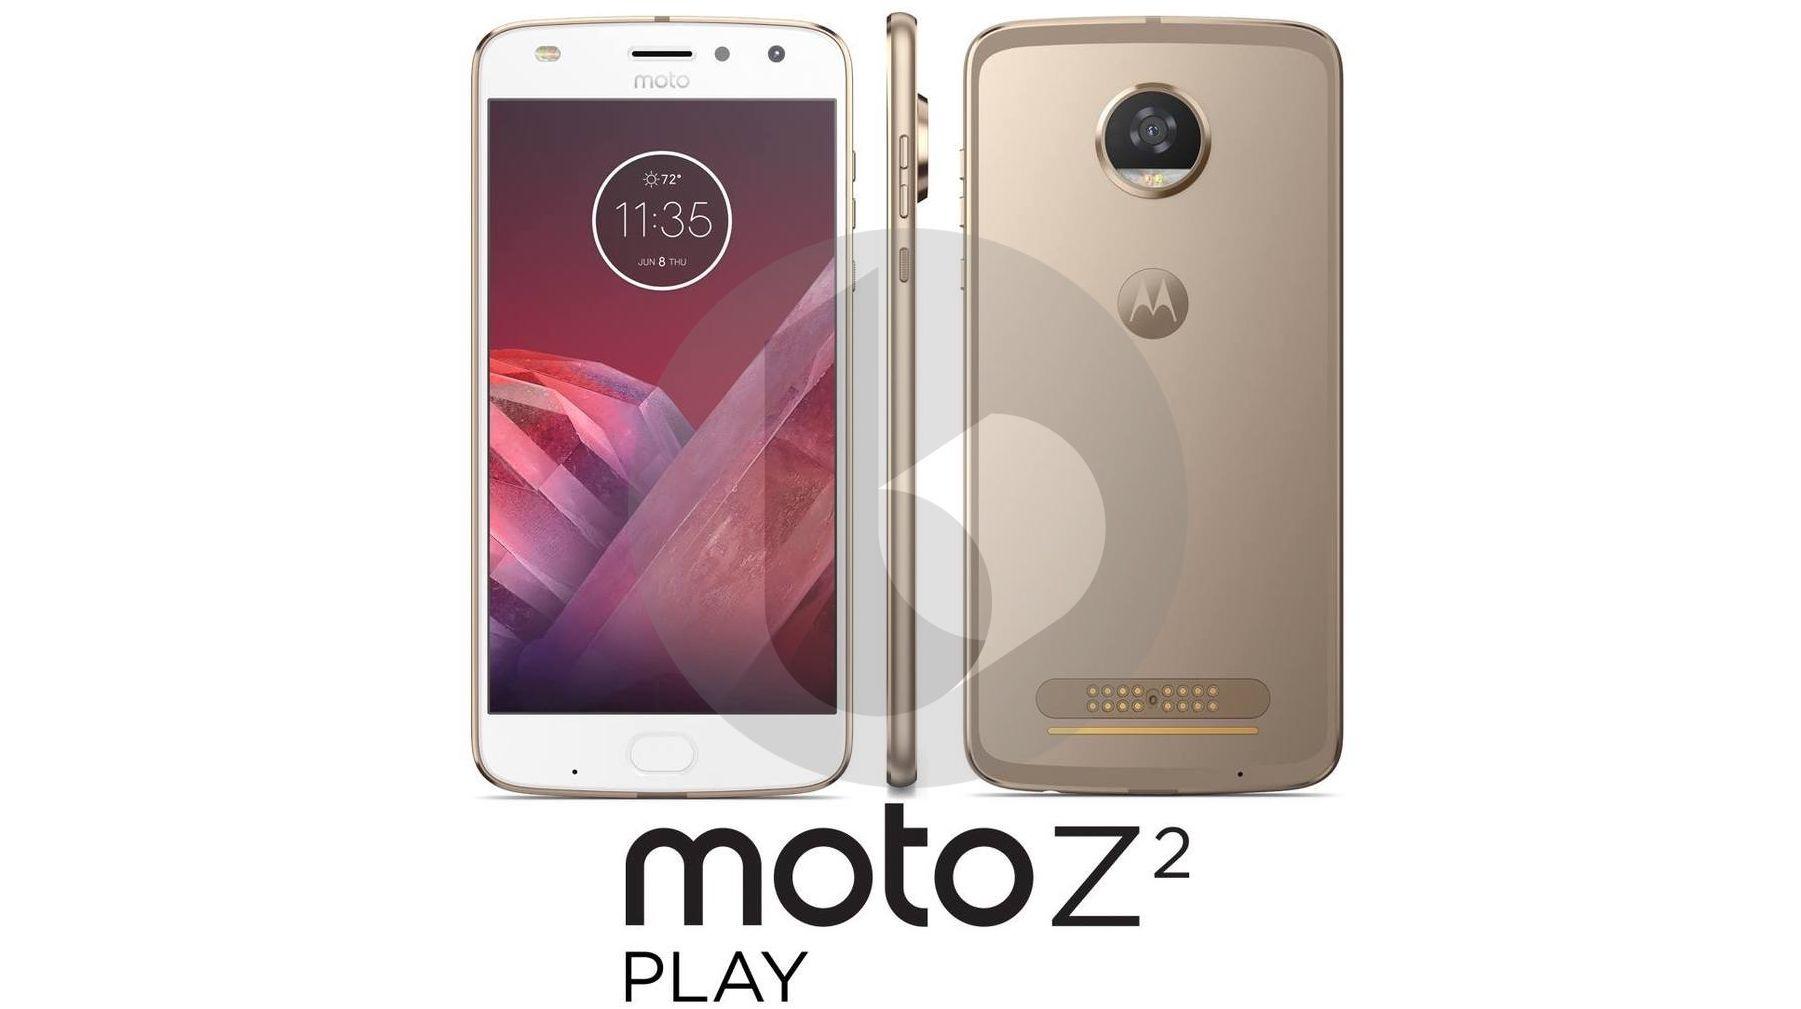 Первая утечка Moto Z2 Play